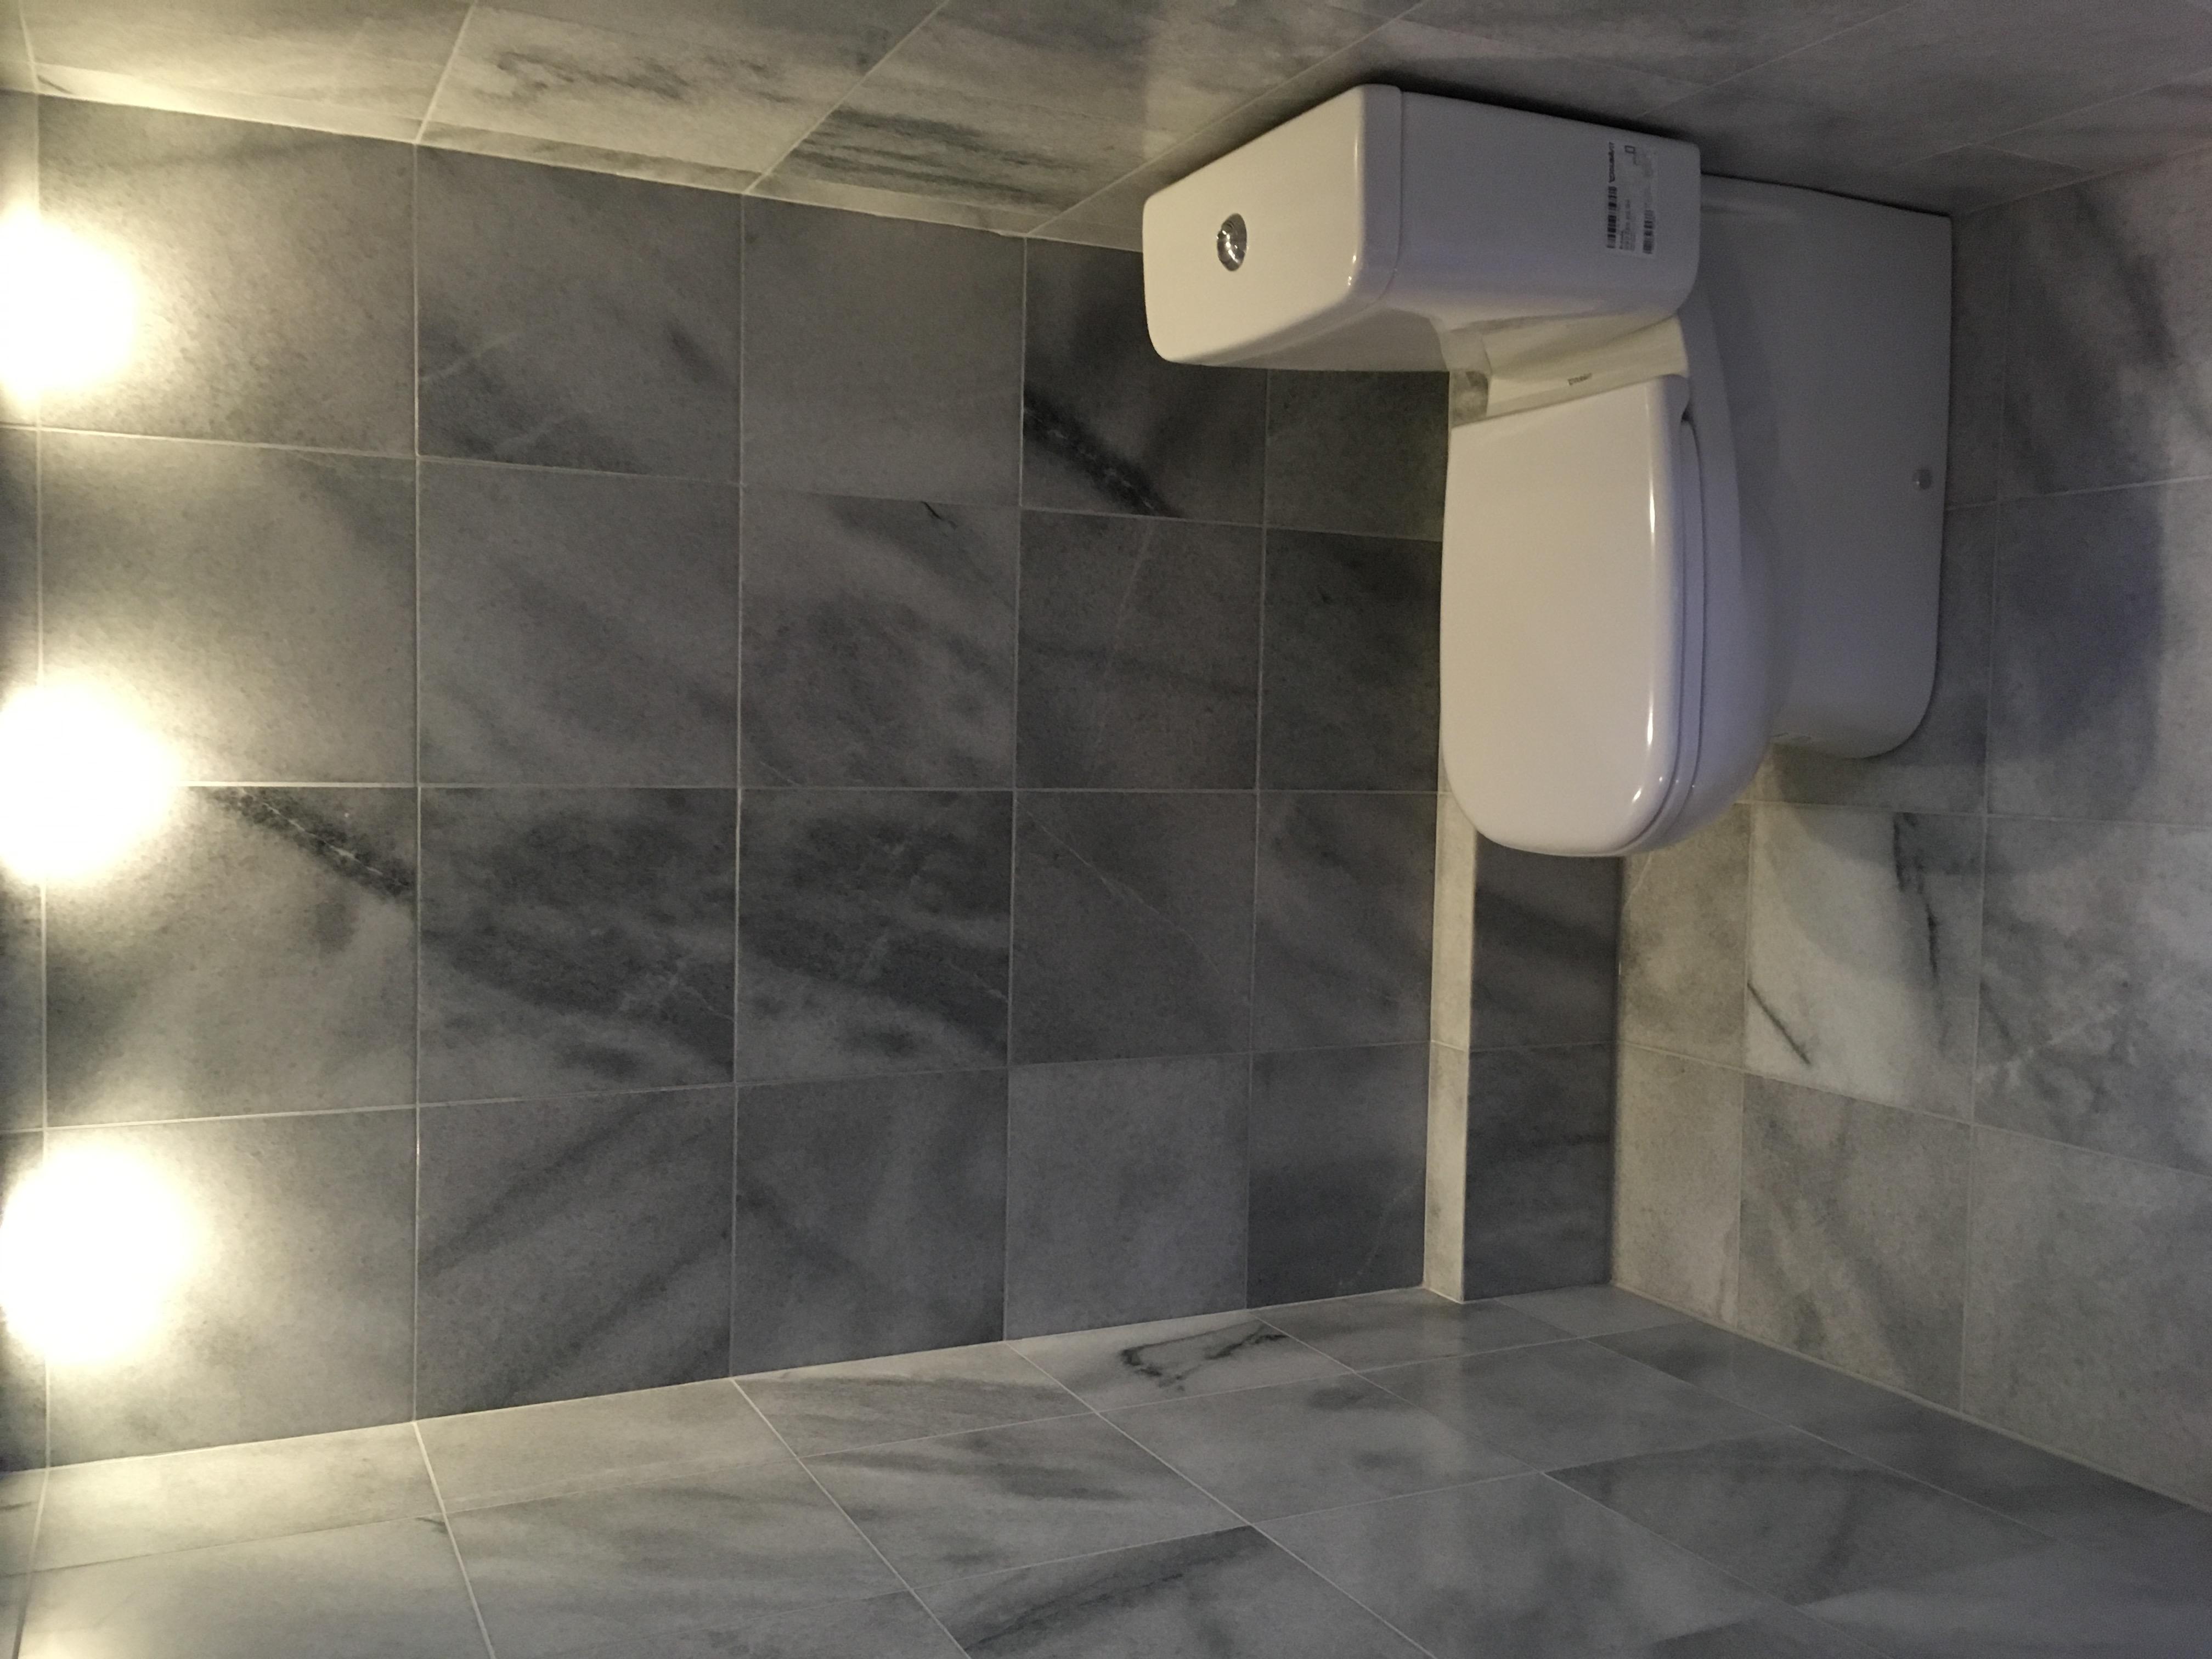 Cristal white marble bathroom tiles (2)